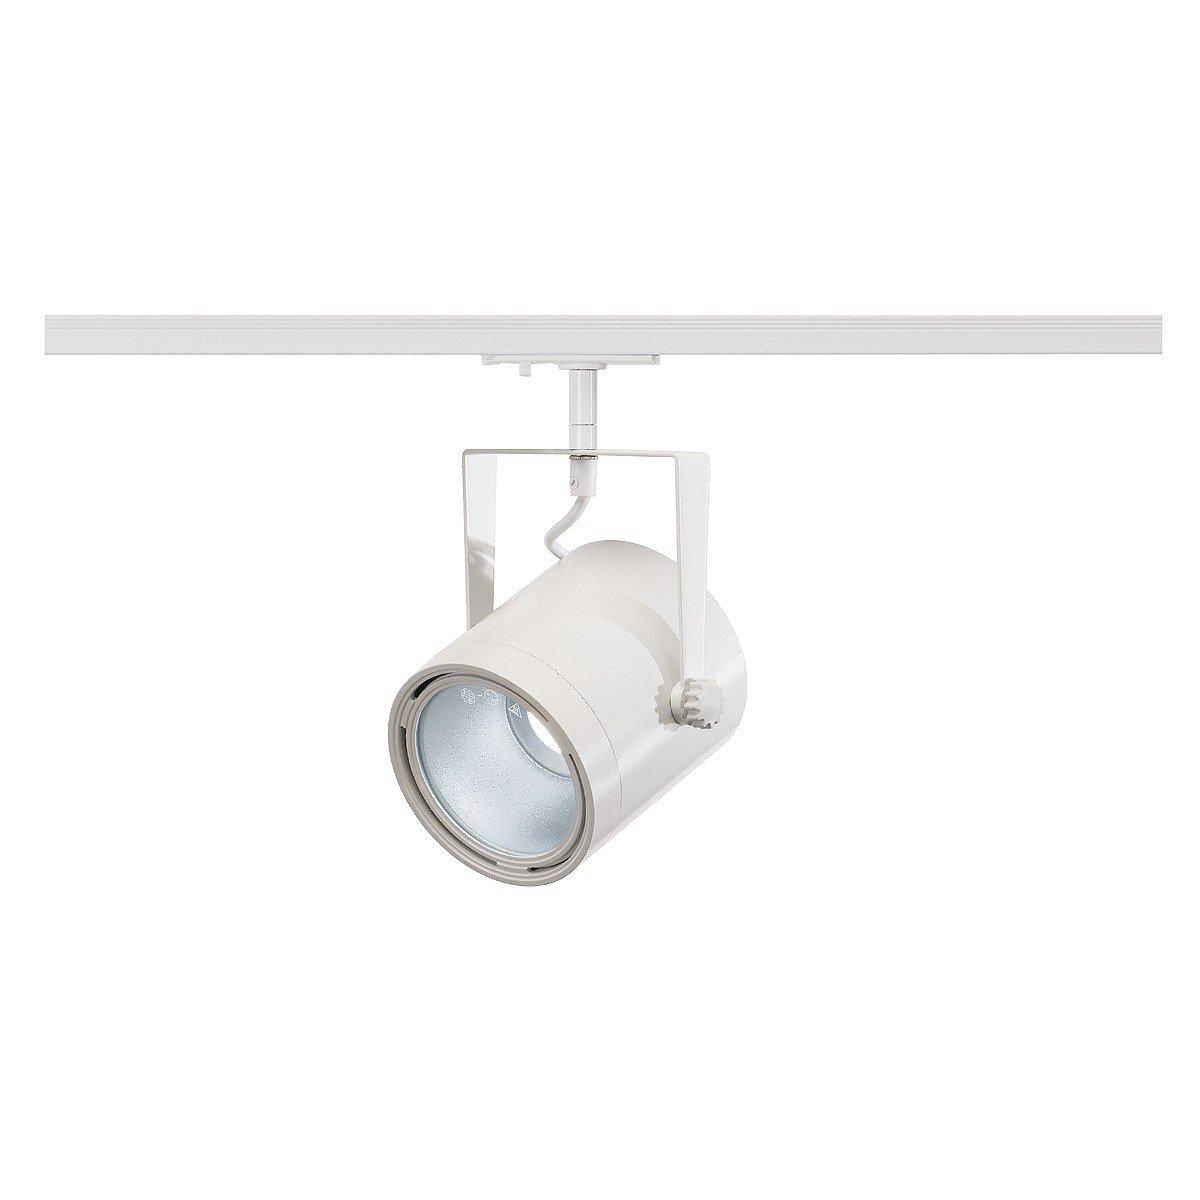 SLV Euro Spot LED Disk 800, 11 W, 4000 K, 60 Grad, inklusive 1P-Adapter, weiß 143841